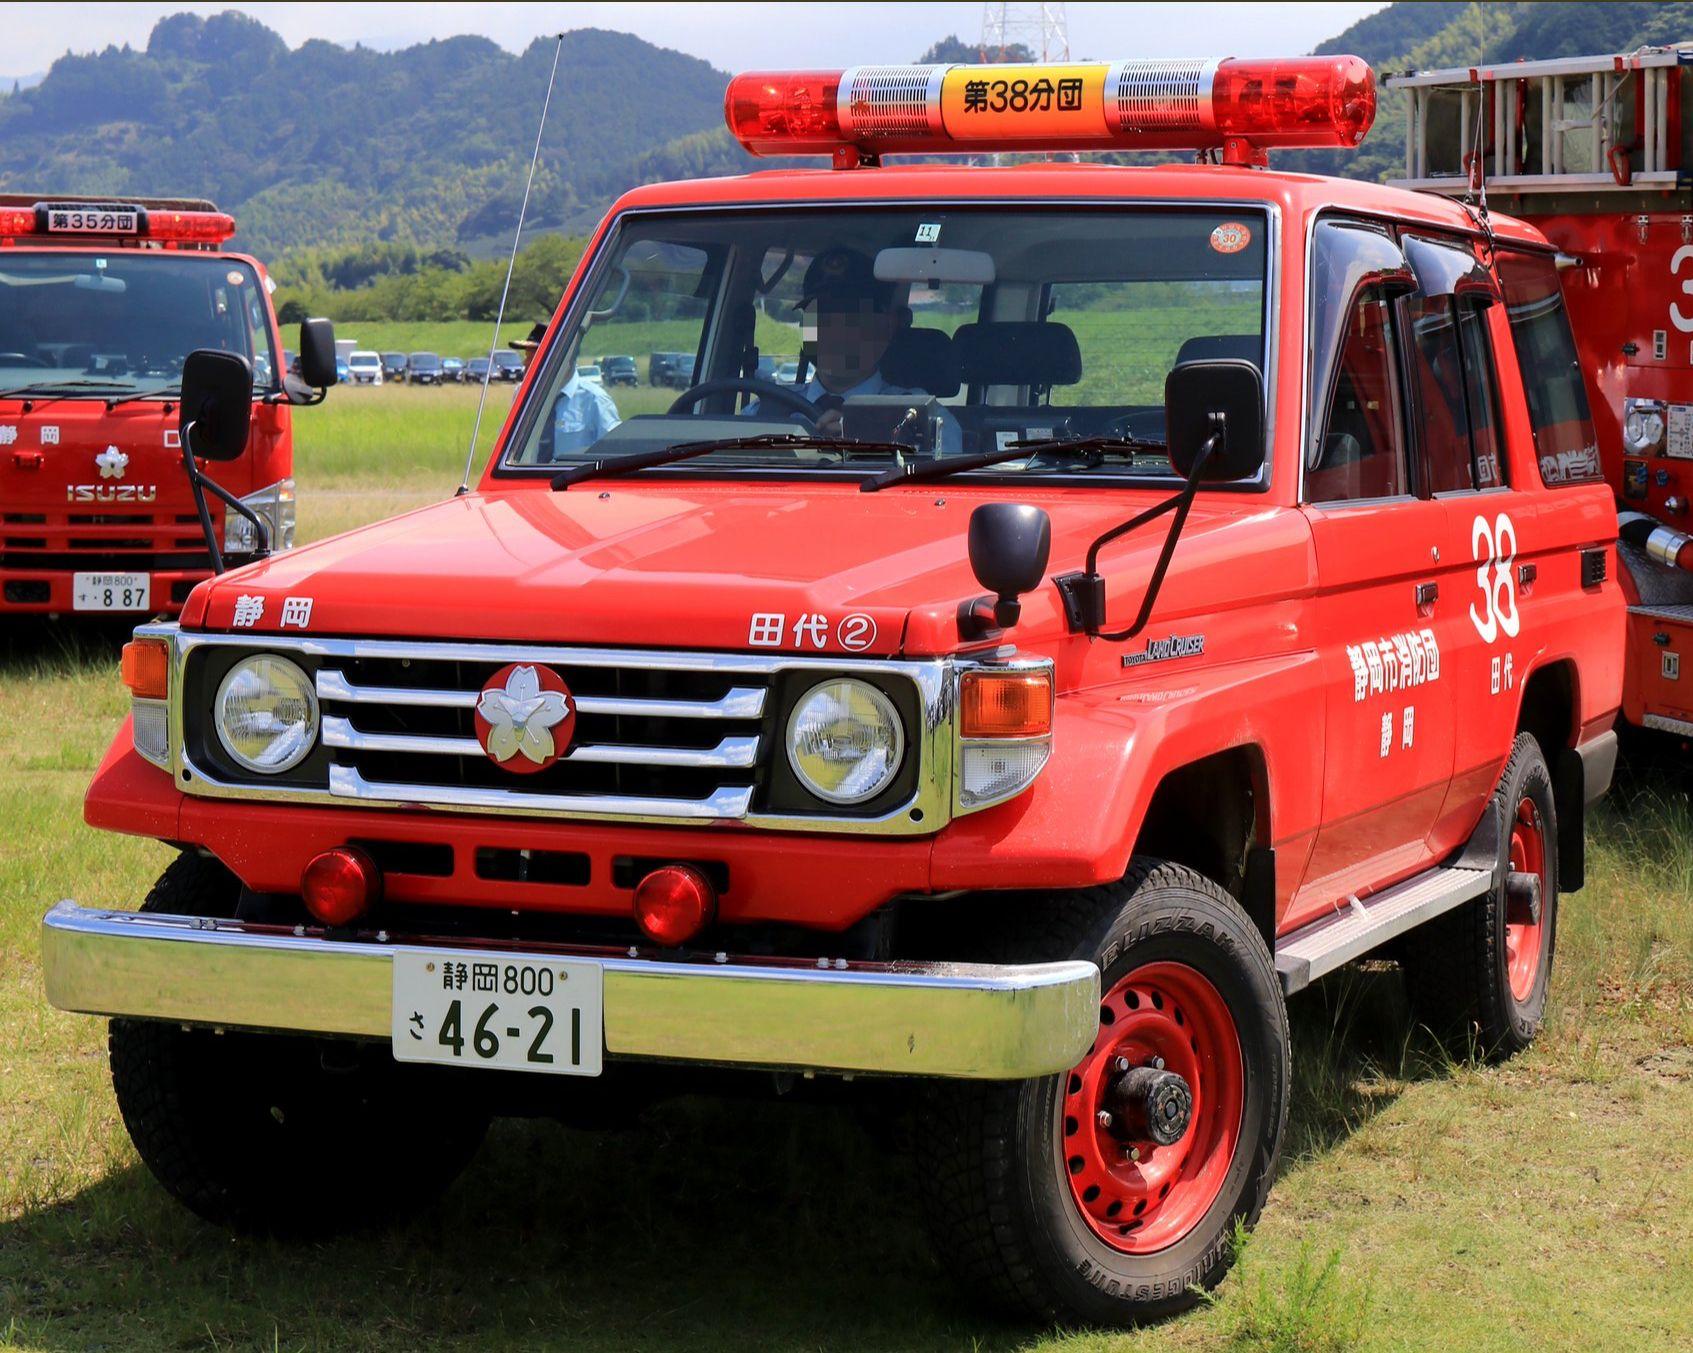 Toyota Land Cruiser Series 70 Fire Truck No 38 Registration No 46 21 H13 Year Shizuoka City Fire Brigade Shizuoka P Land Cruiser Jeep Suv Toyota Trucks